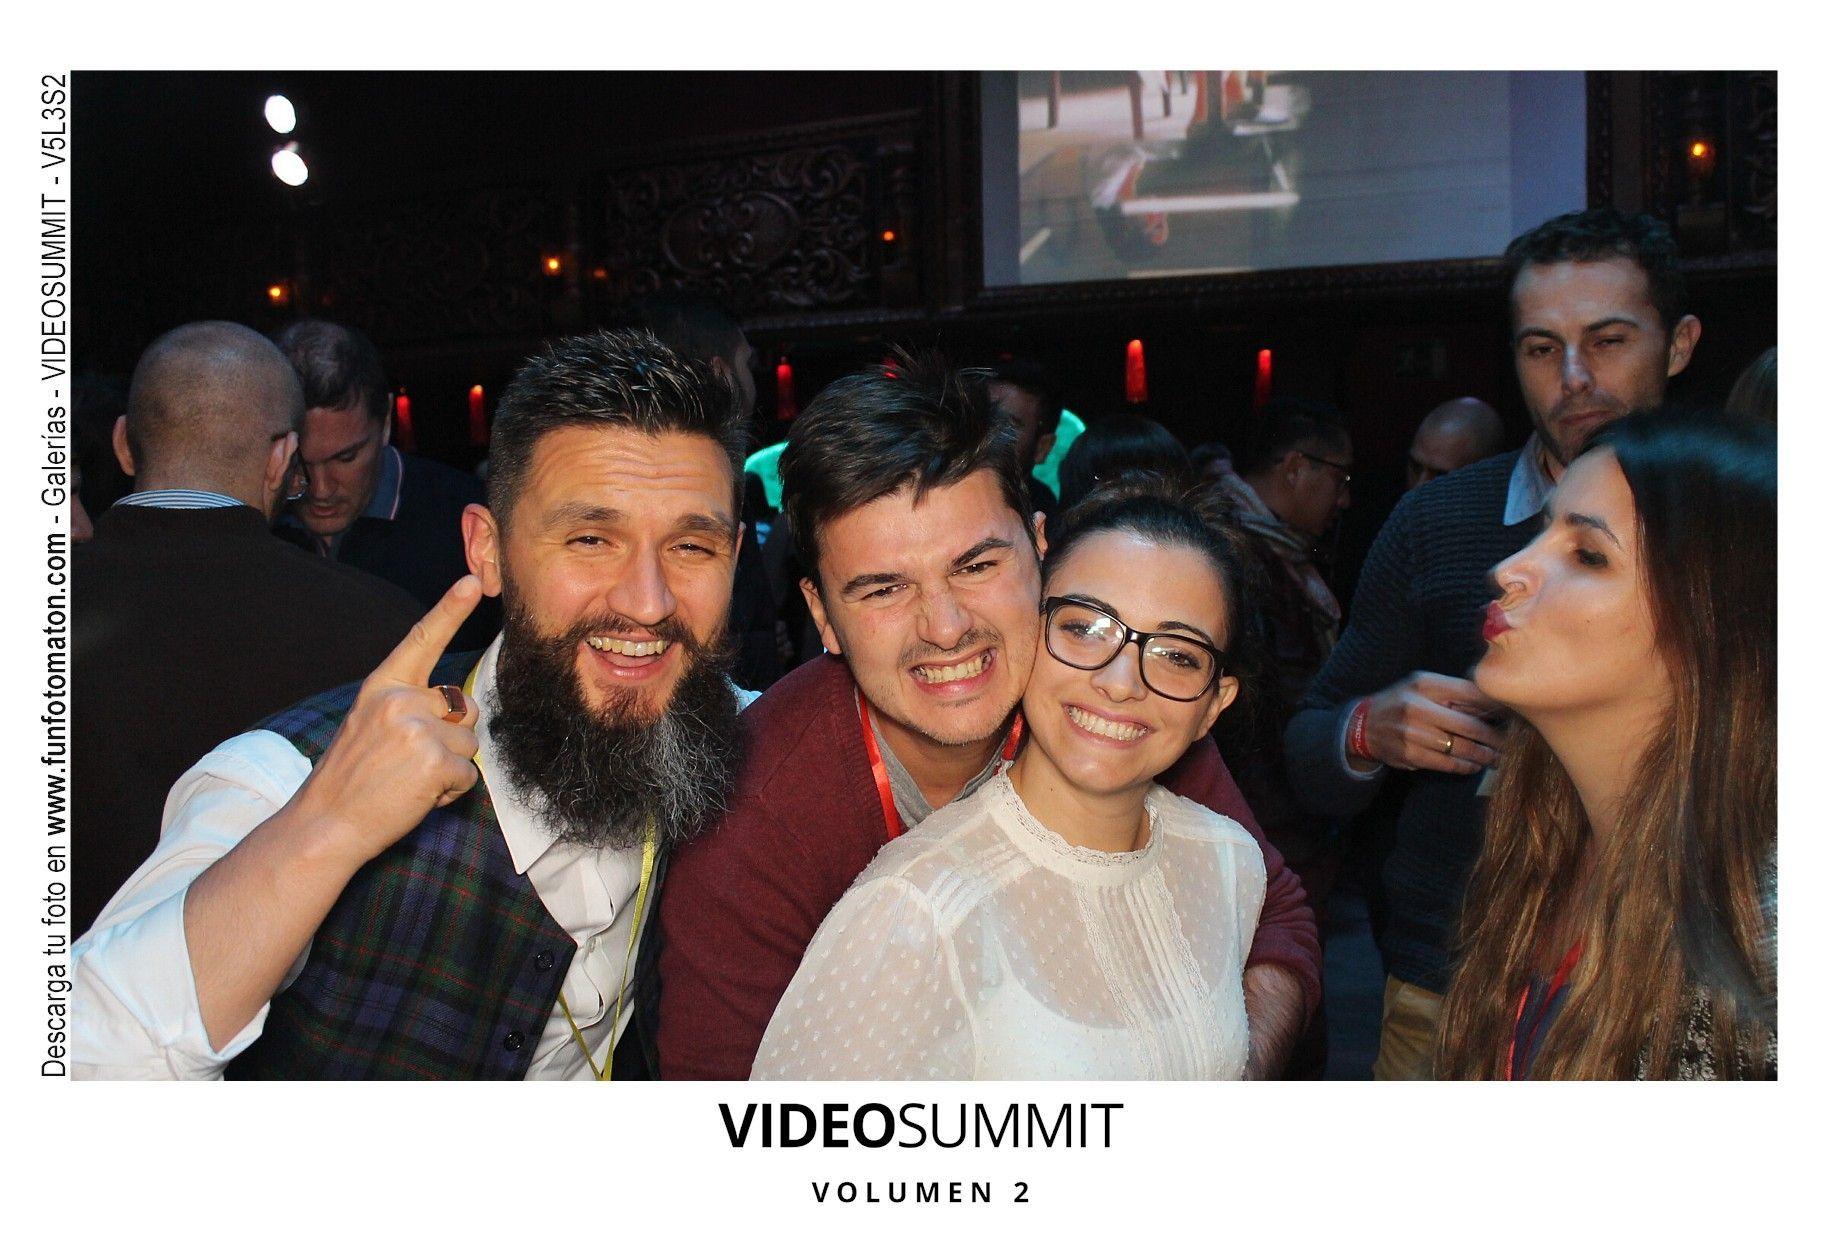 videosummit-vol2-club-party-043